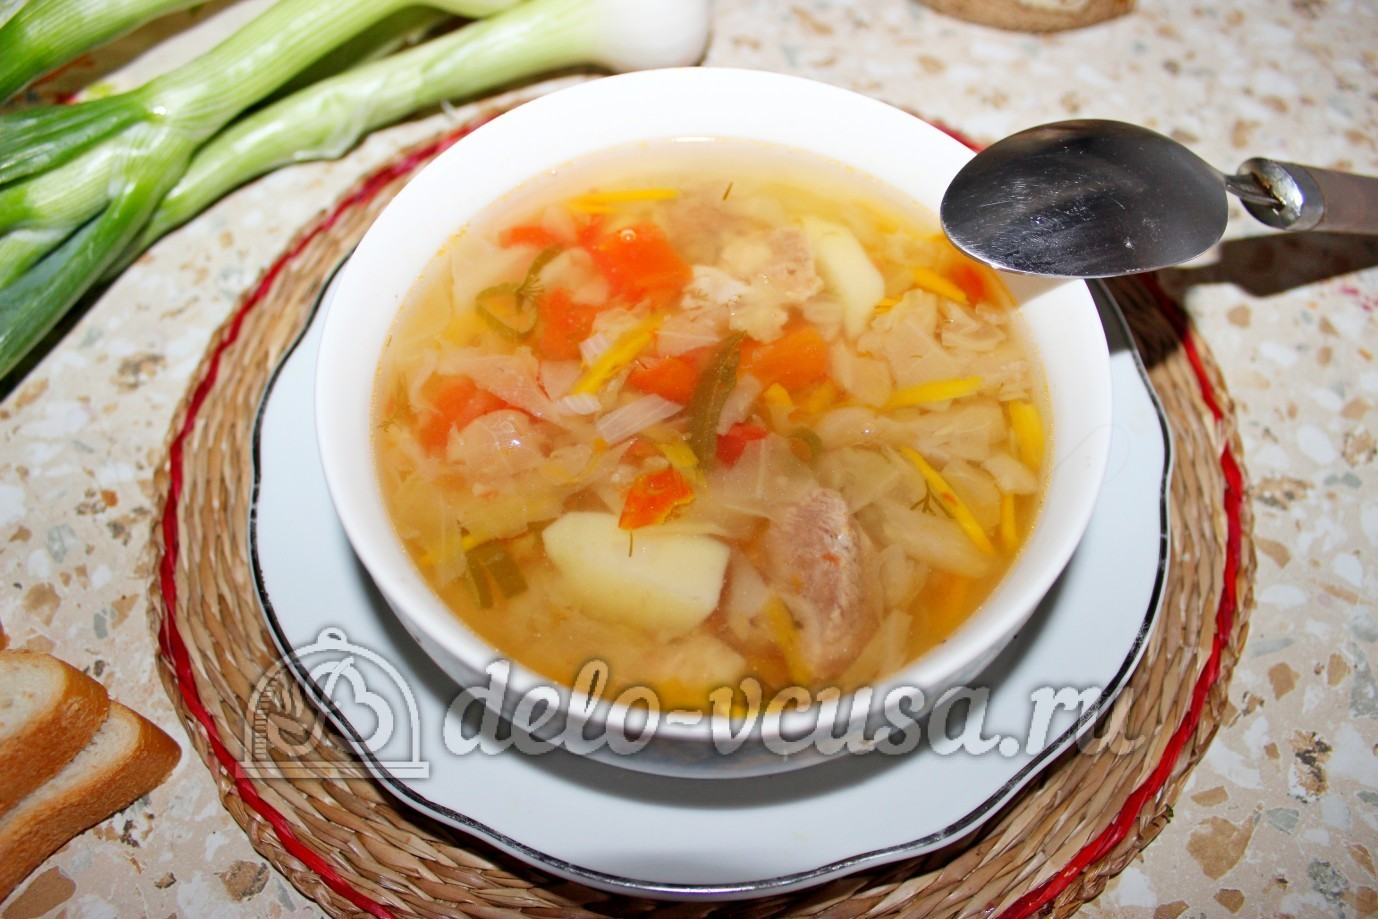 Мясо с грибами и овощами рецепт с фото пошагово